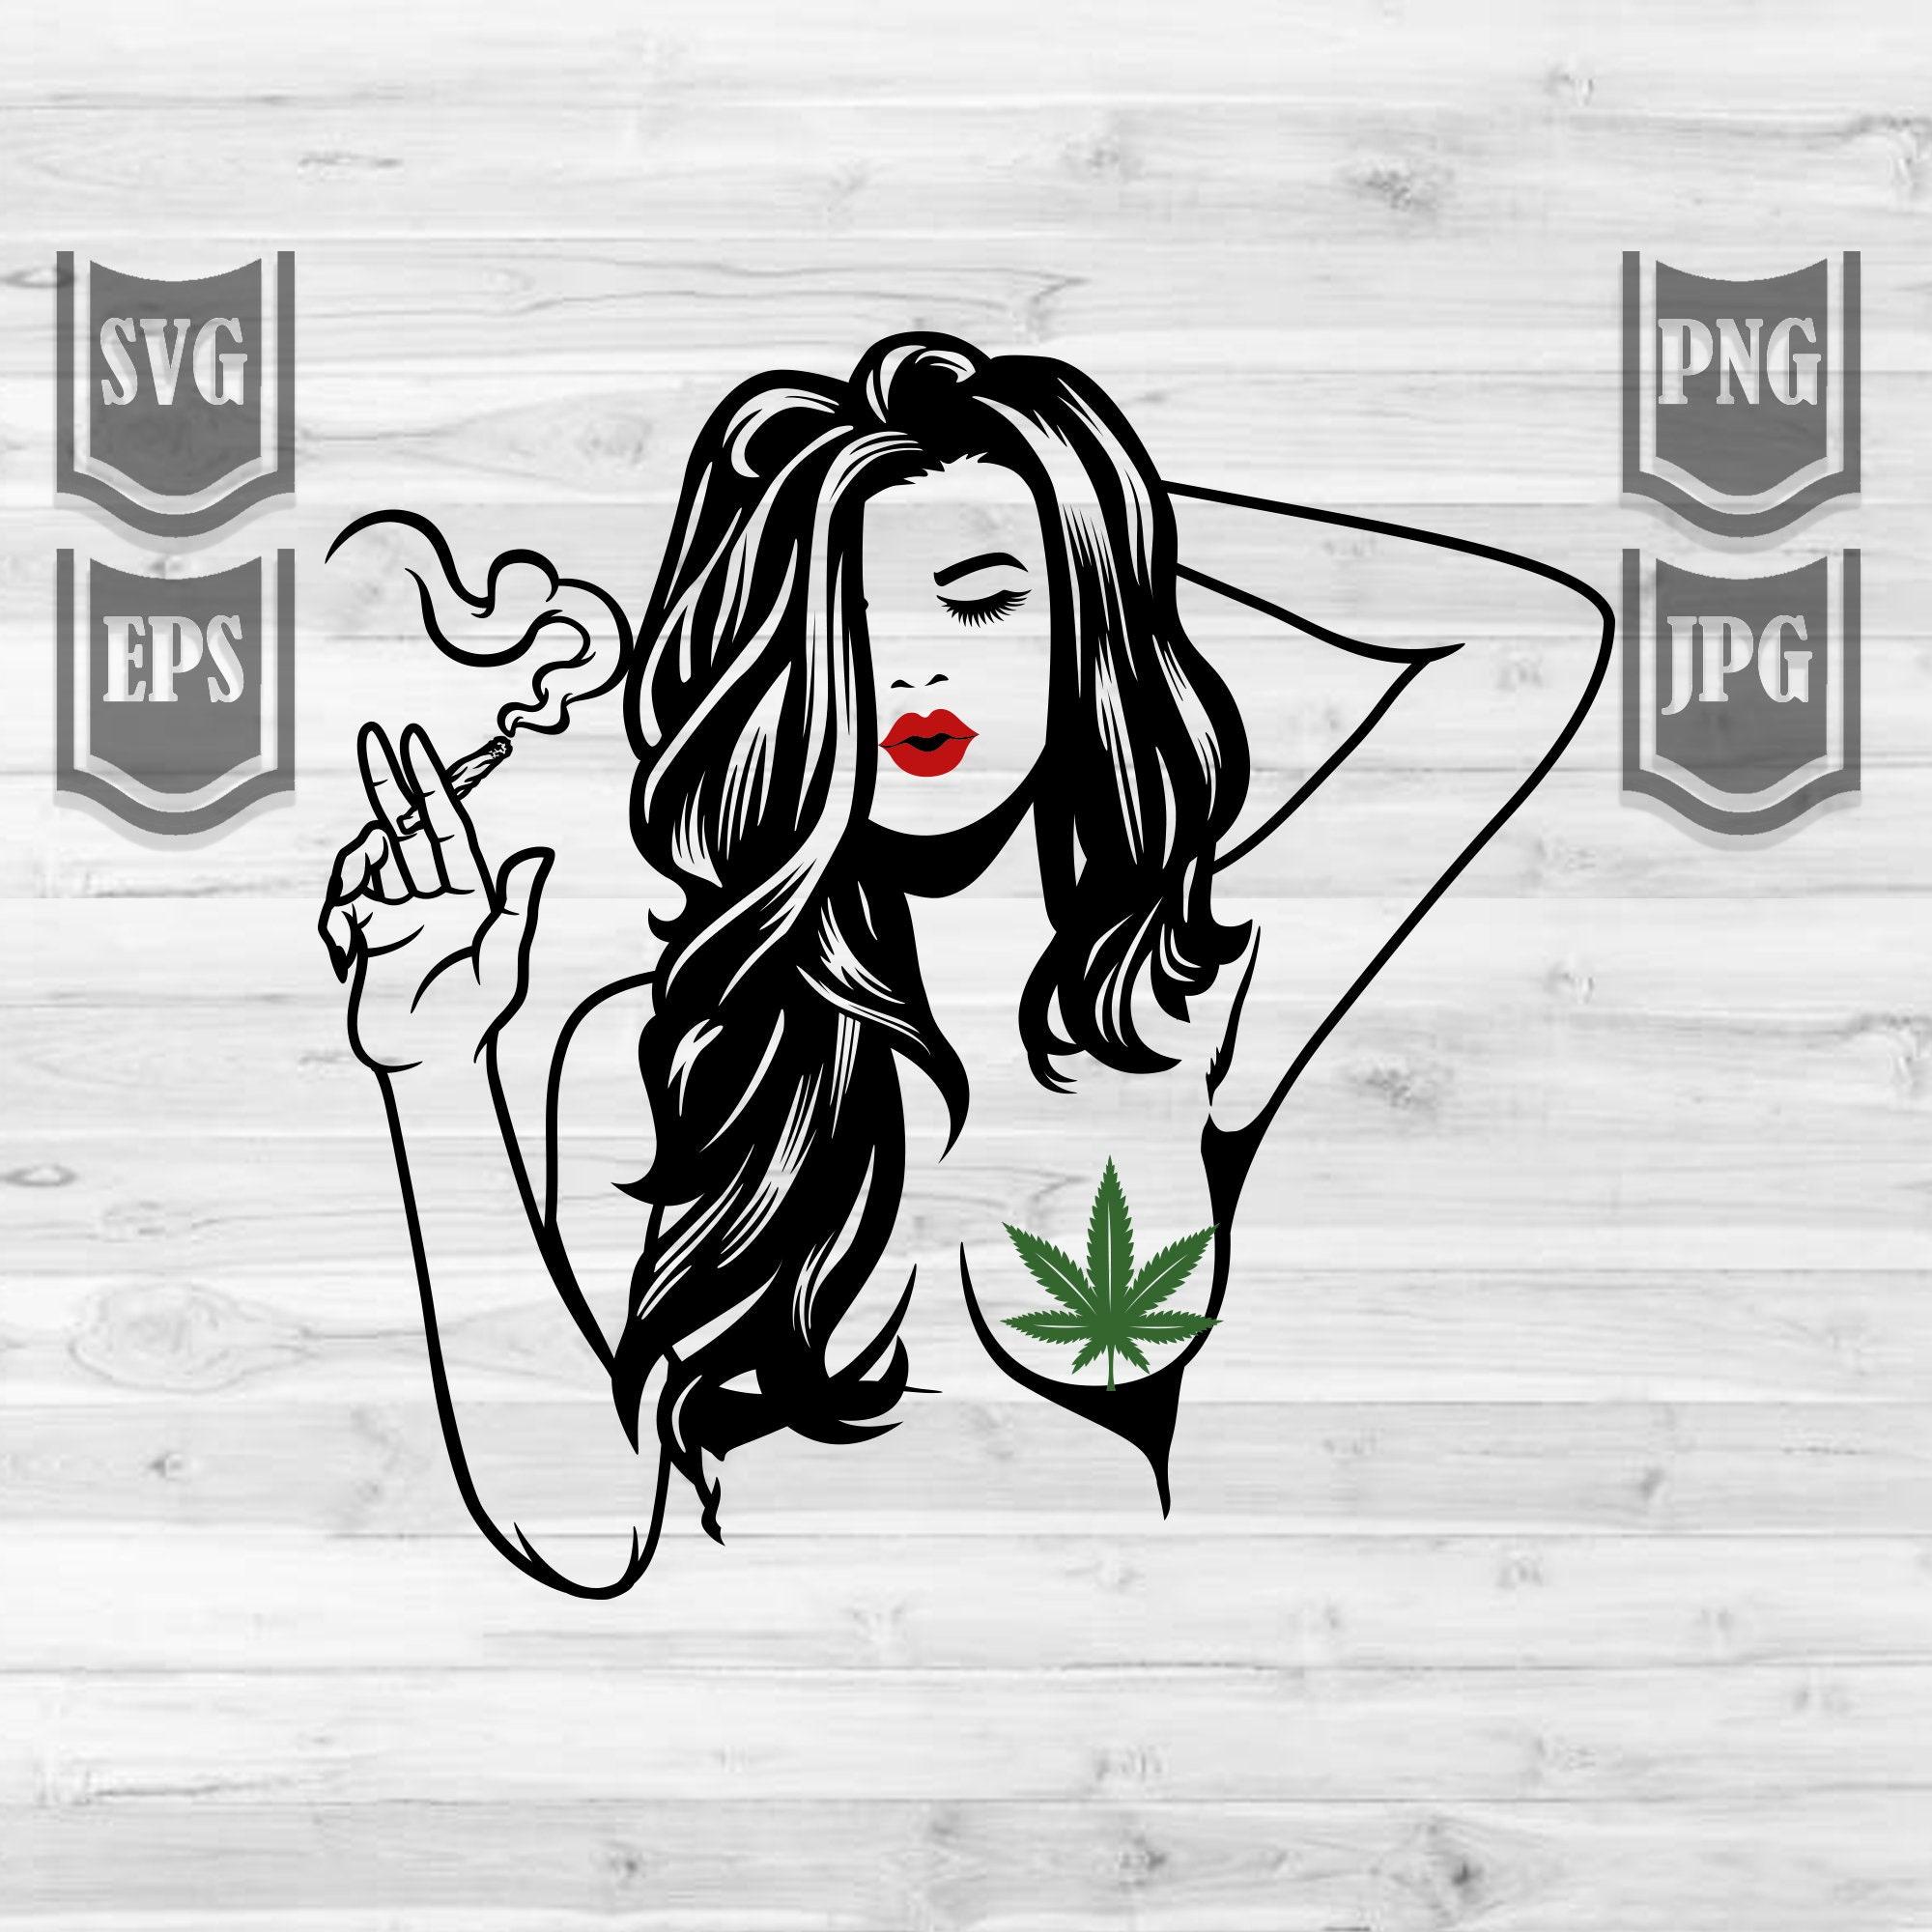 Sexy women smoking northern ireland